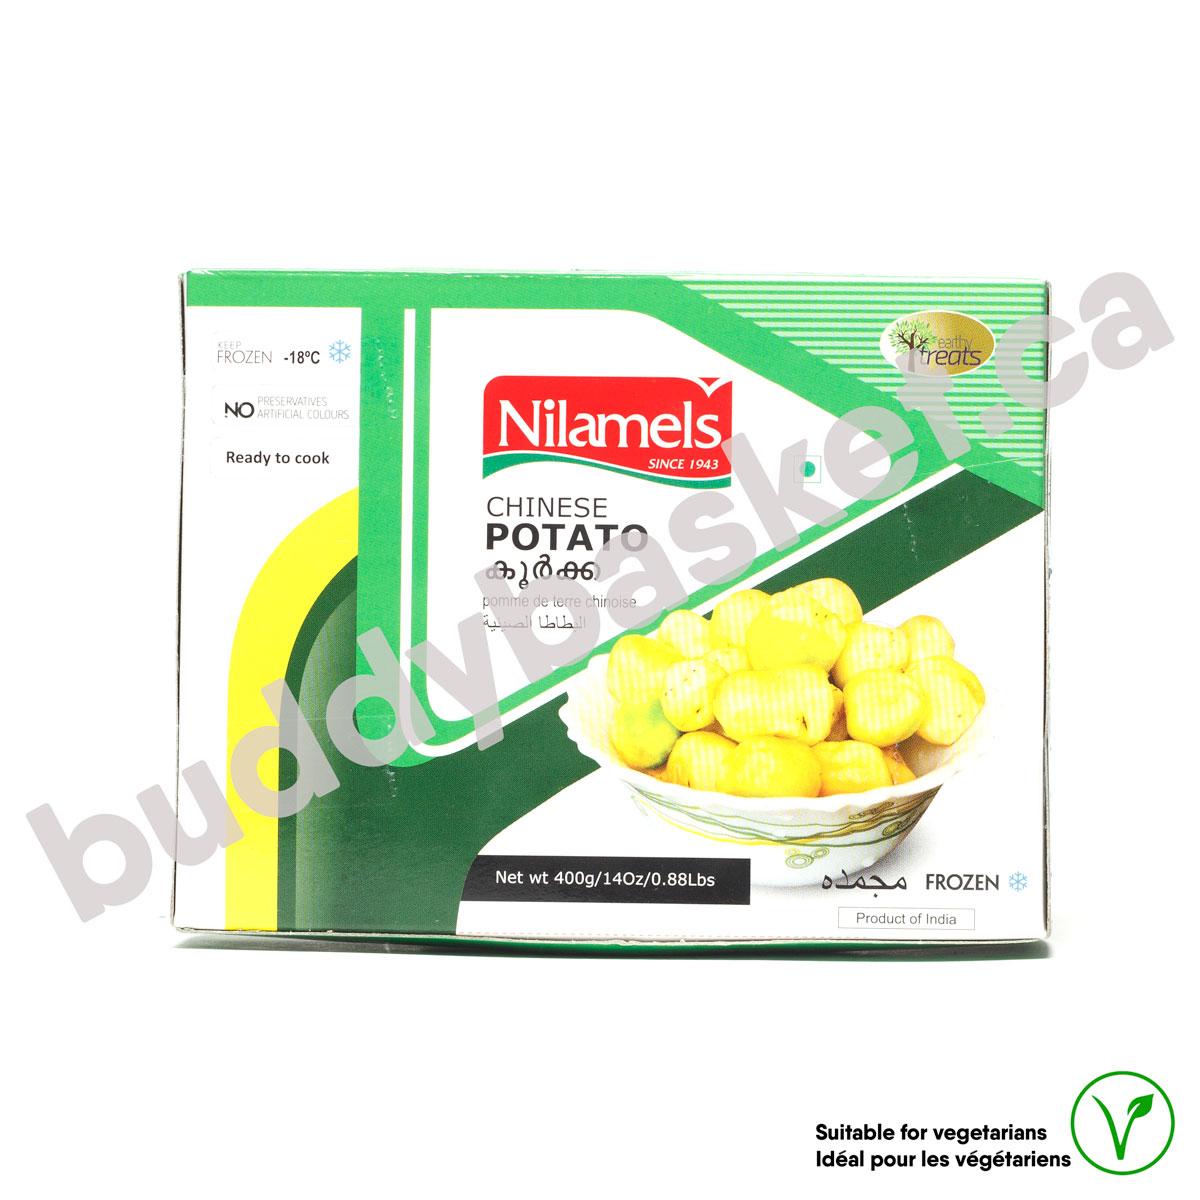 Nilamels Chinese Potato 400g